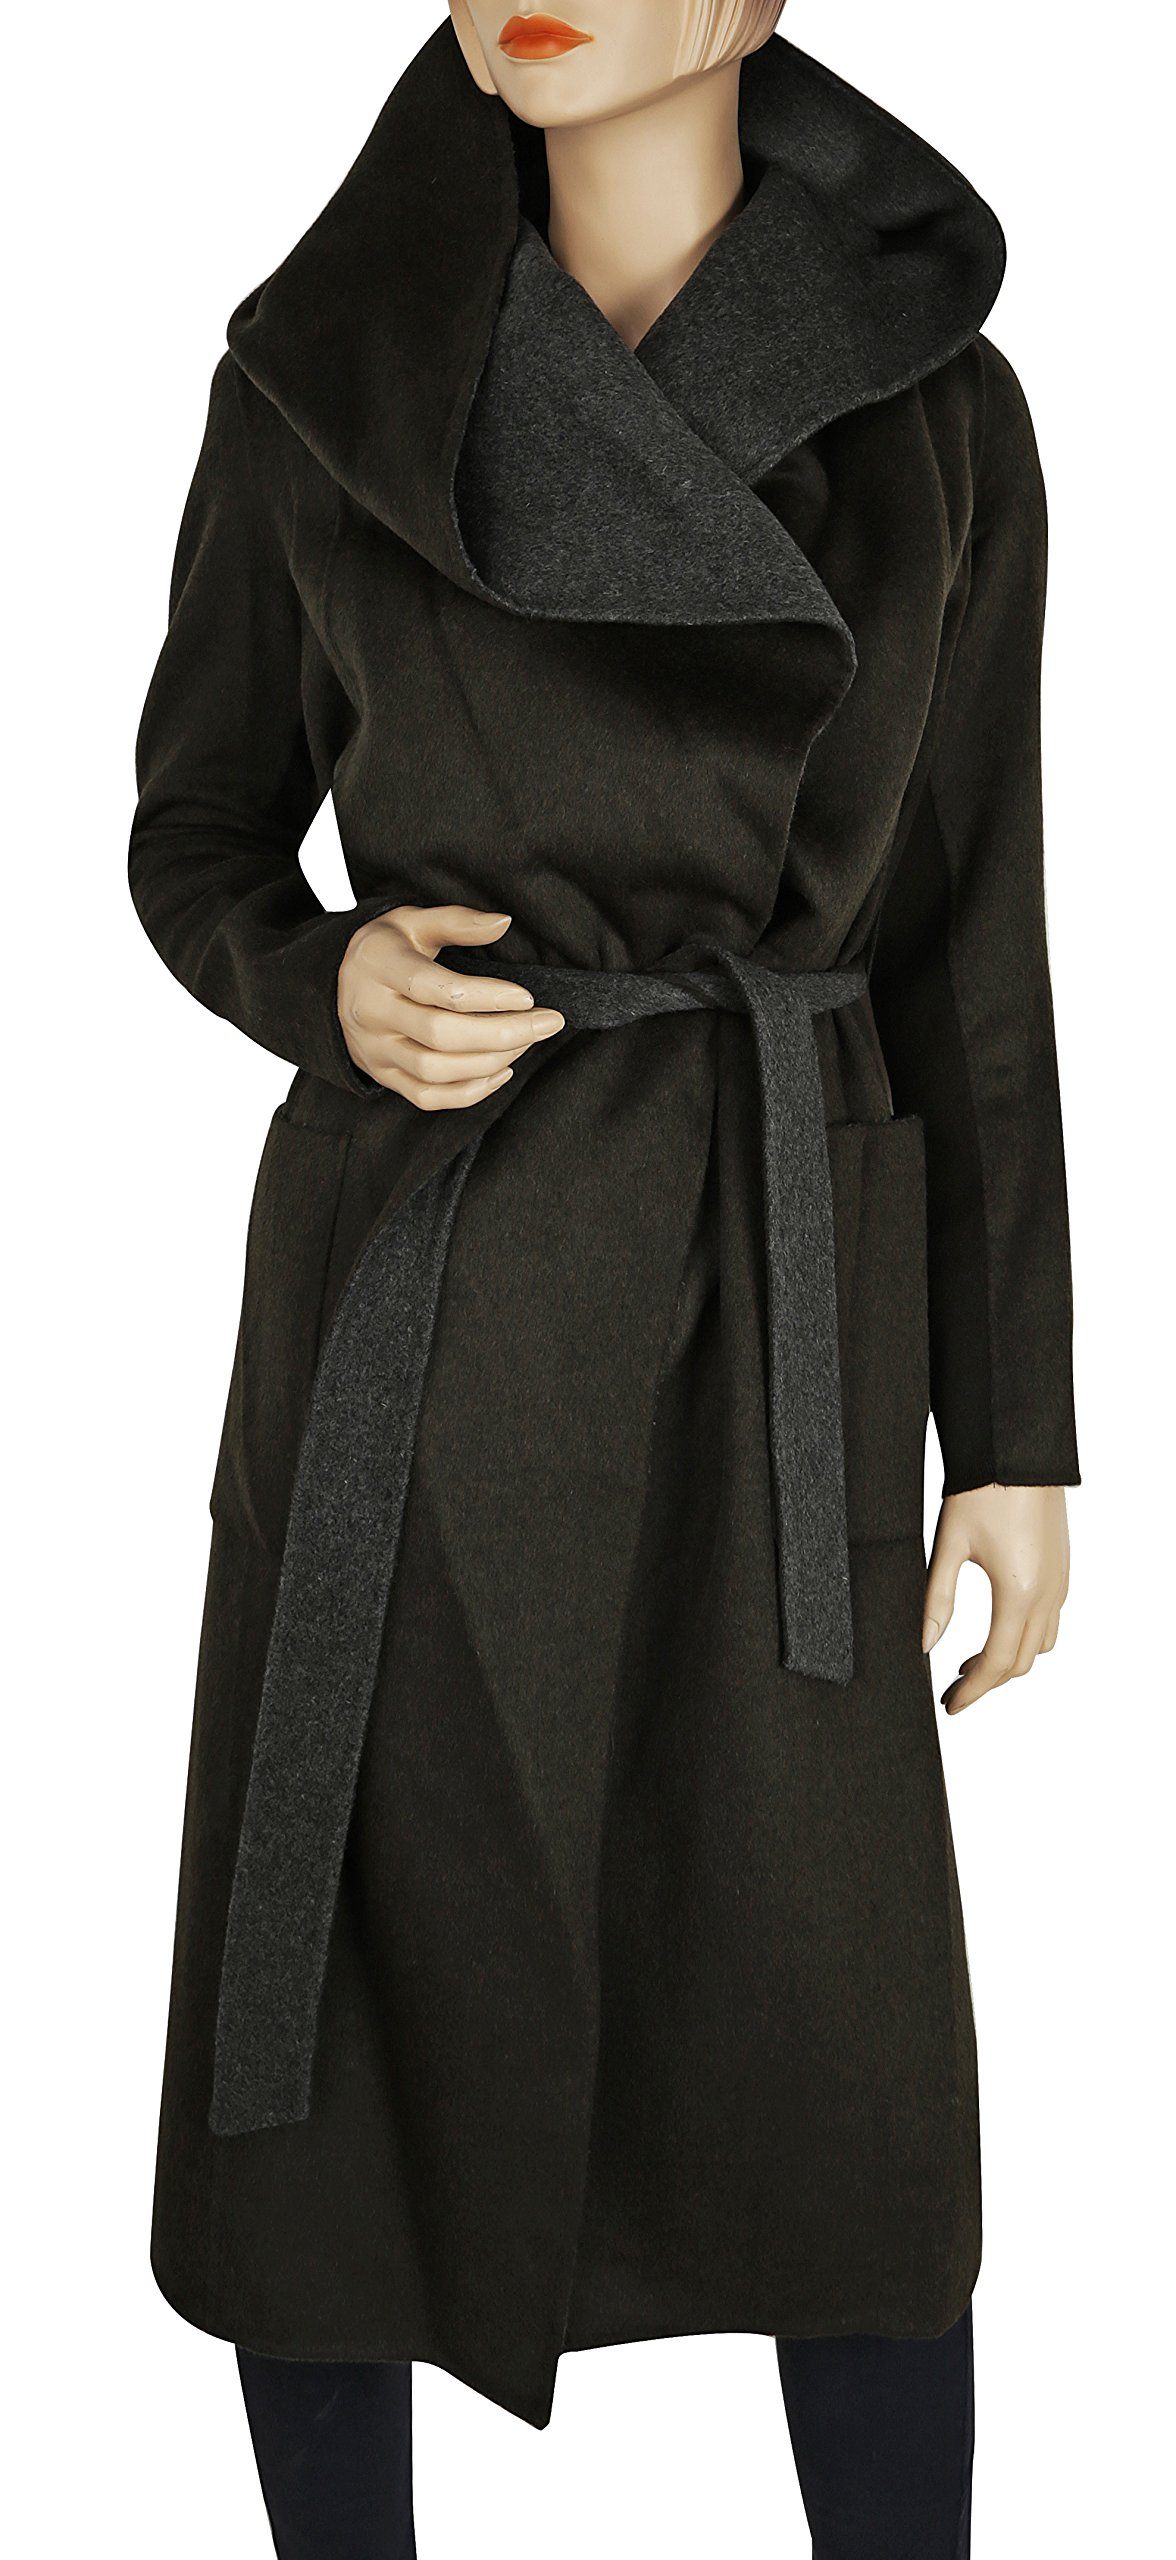 BCBGMaxazria Chandler Olive Green Long Wool Hooded Coat (S)